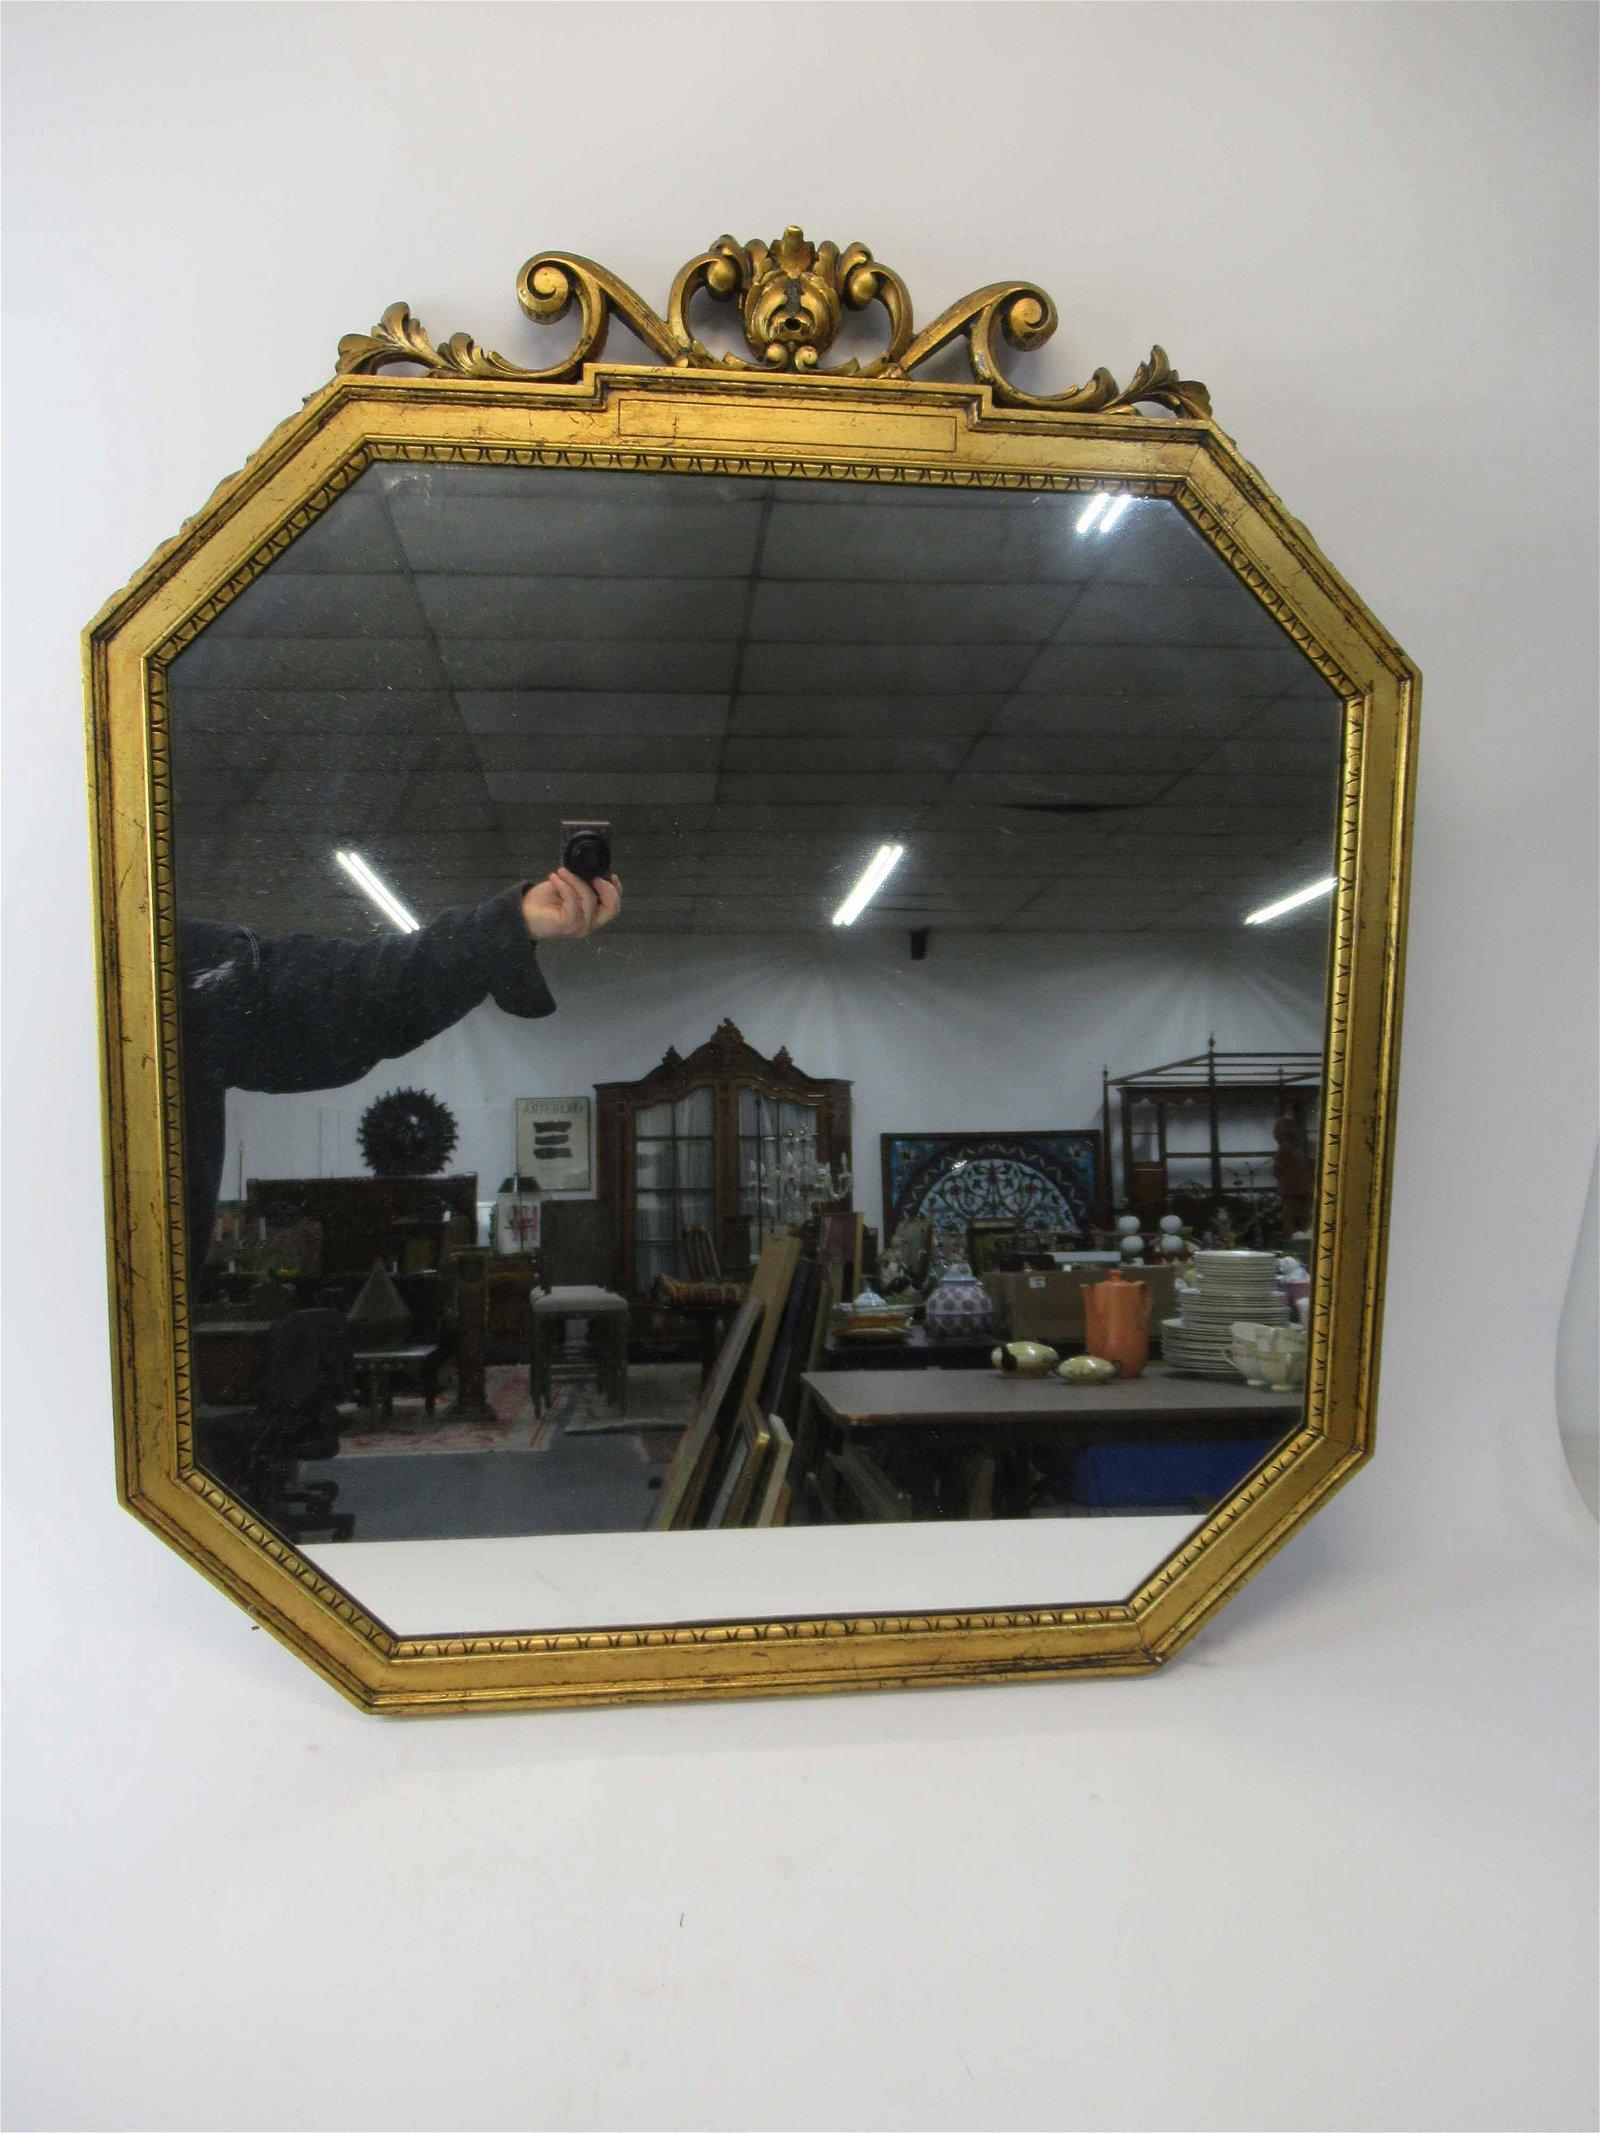 Giltwood Octagonal Form Hanging Wall Mirror